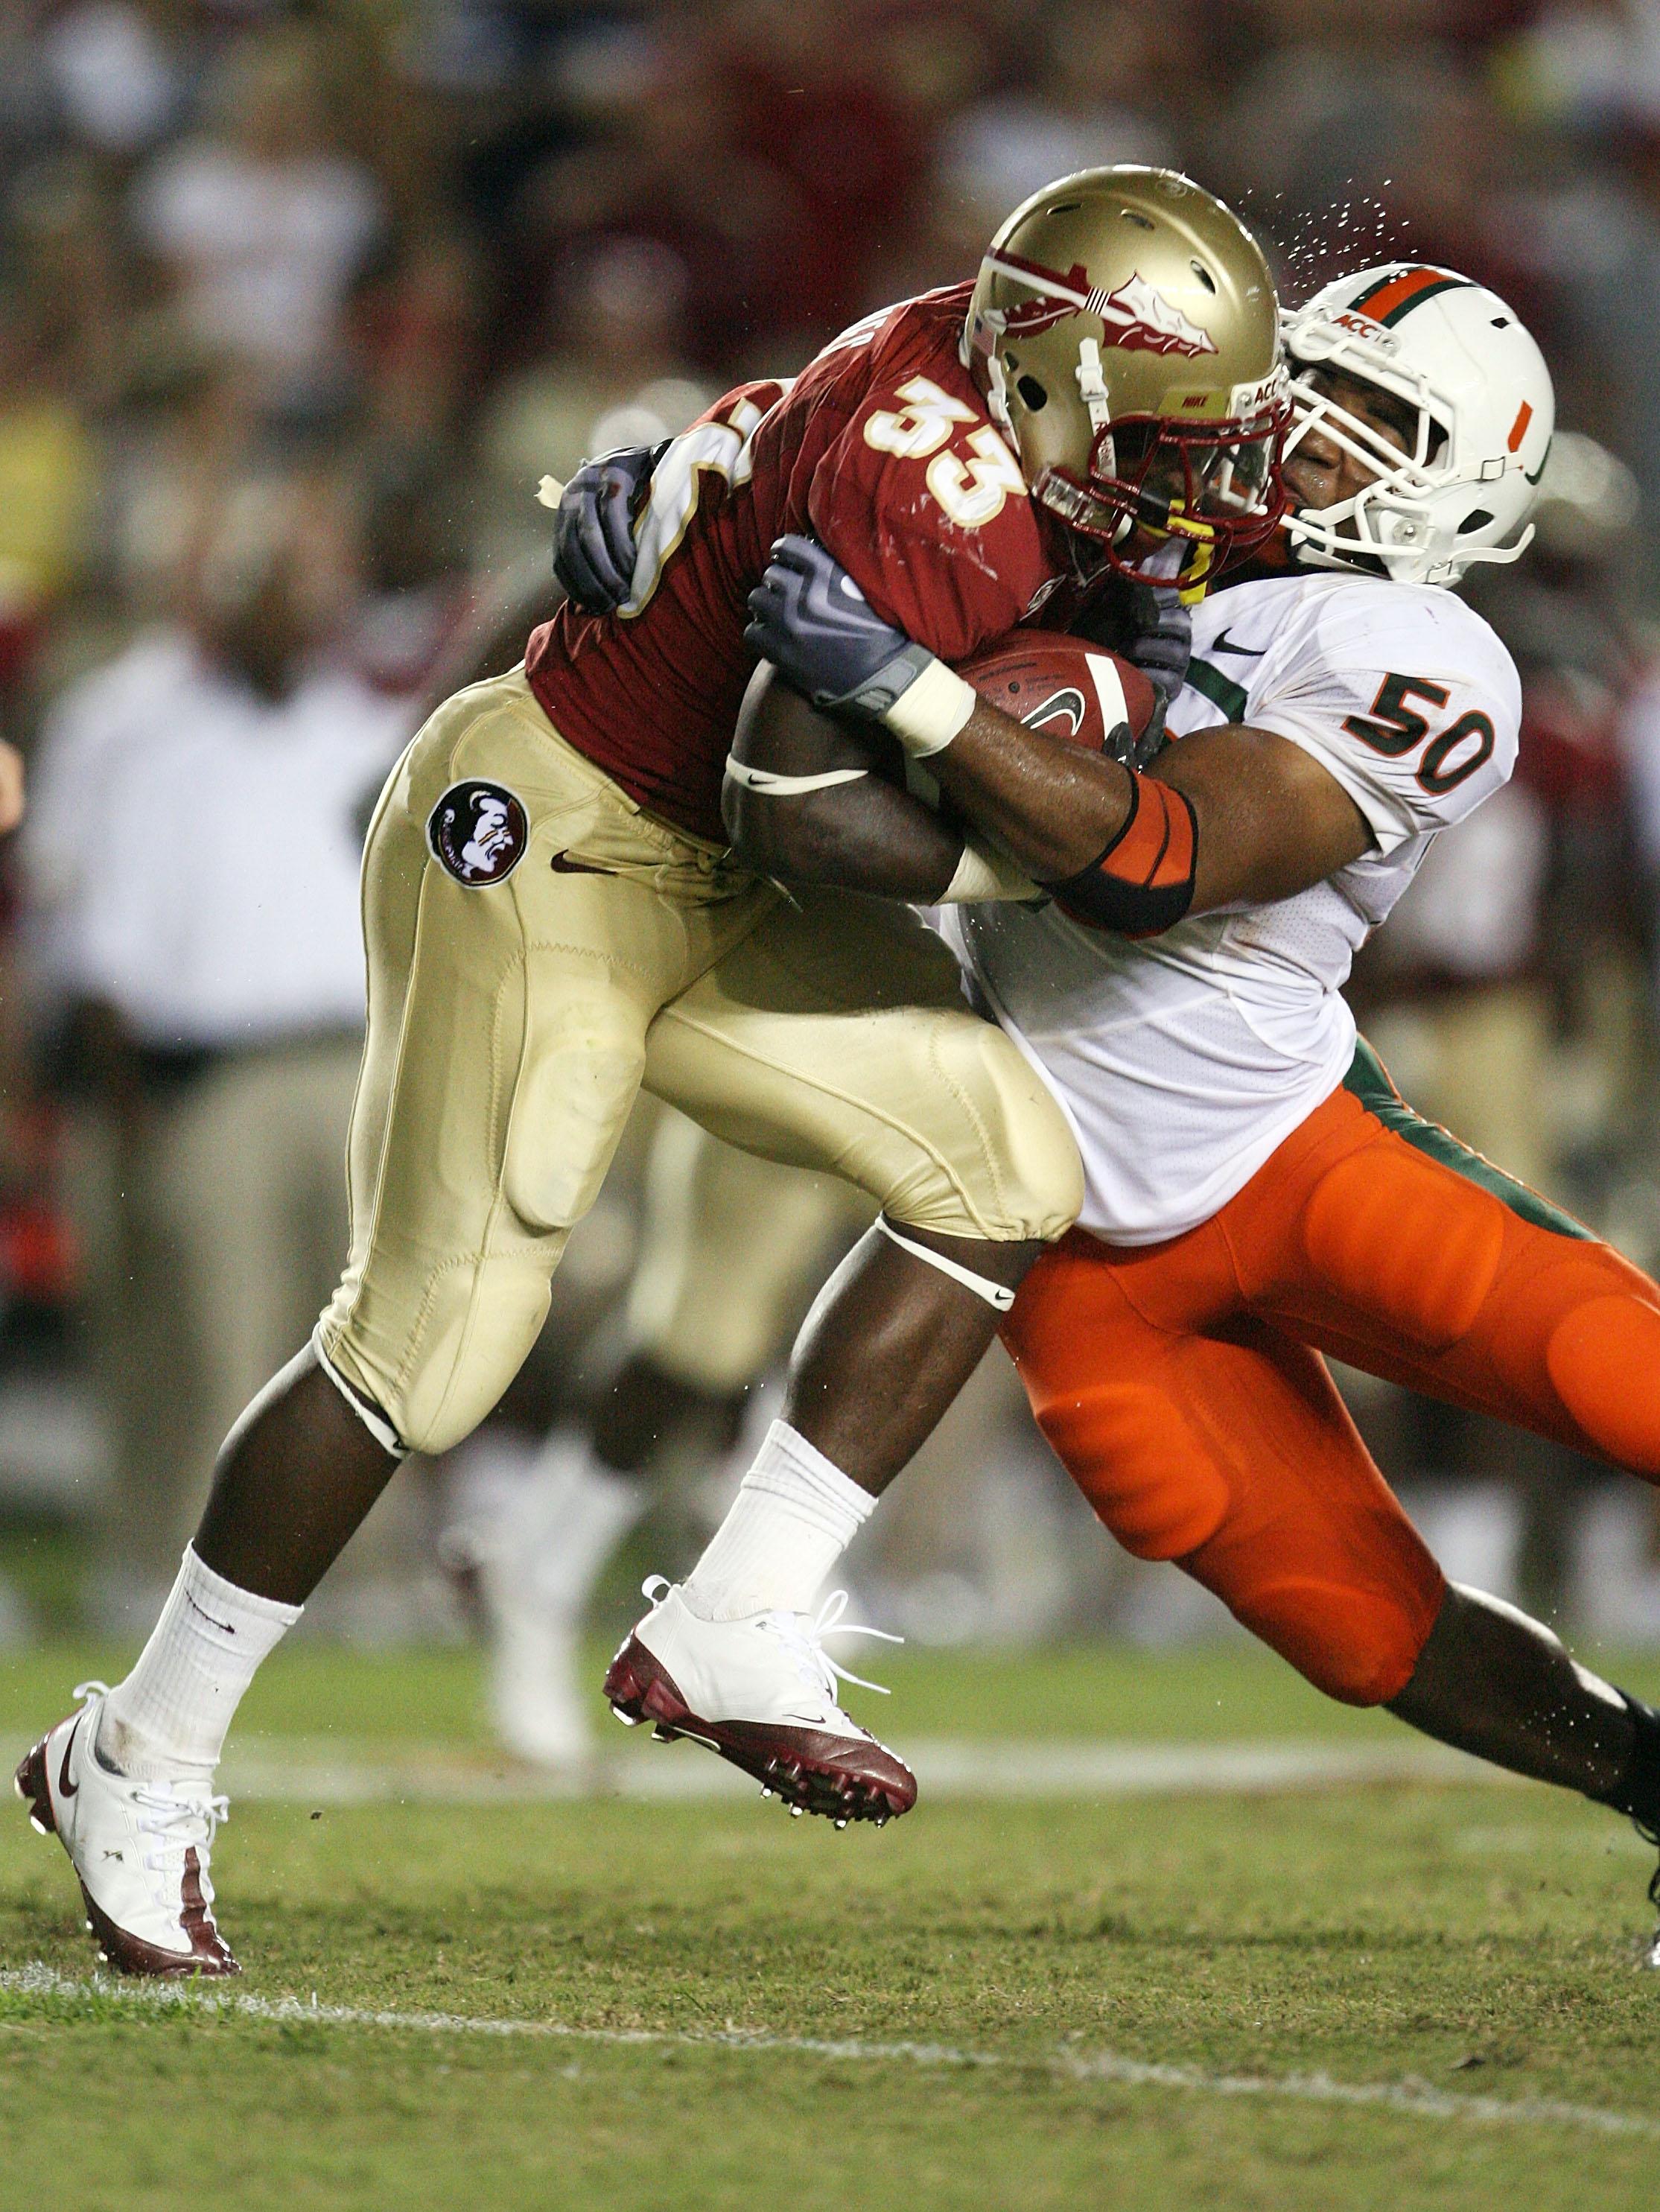 TALLAHASSEE, FL - SEPTEMBER 07:  Linebacker Darryl Sharpton #50 of the Miami Hurricanes brings down running back Ty Jones #33 of the Florida State Seminoles at Doak Campbell Stadium on September 7, 2009 in Tallahassee, Florida. Miami defeated Florida Stat